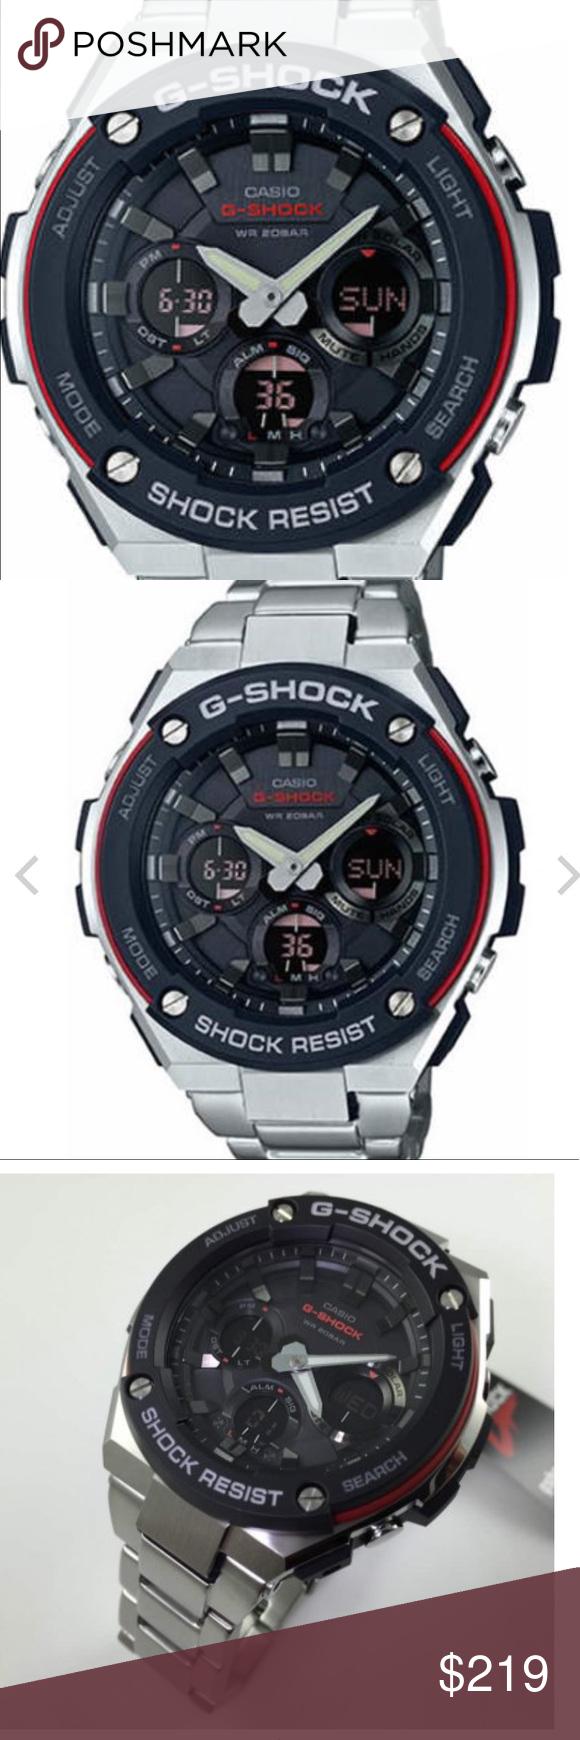 973132a0c29 G-shock watch all metal